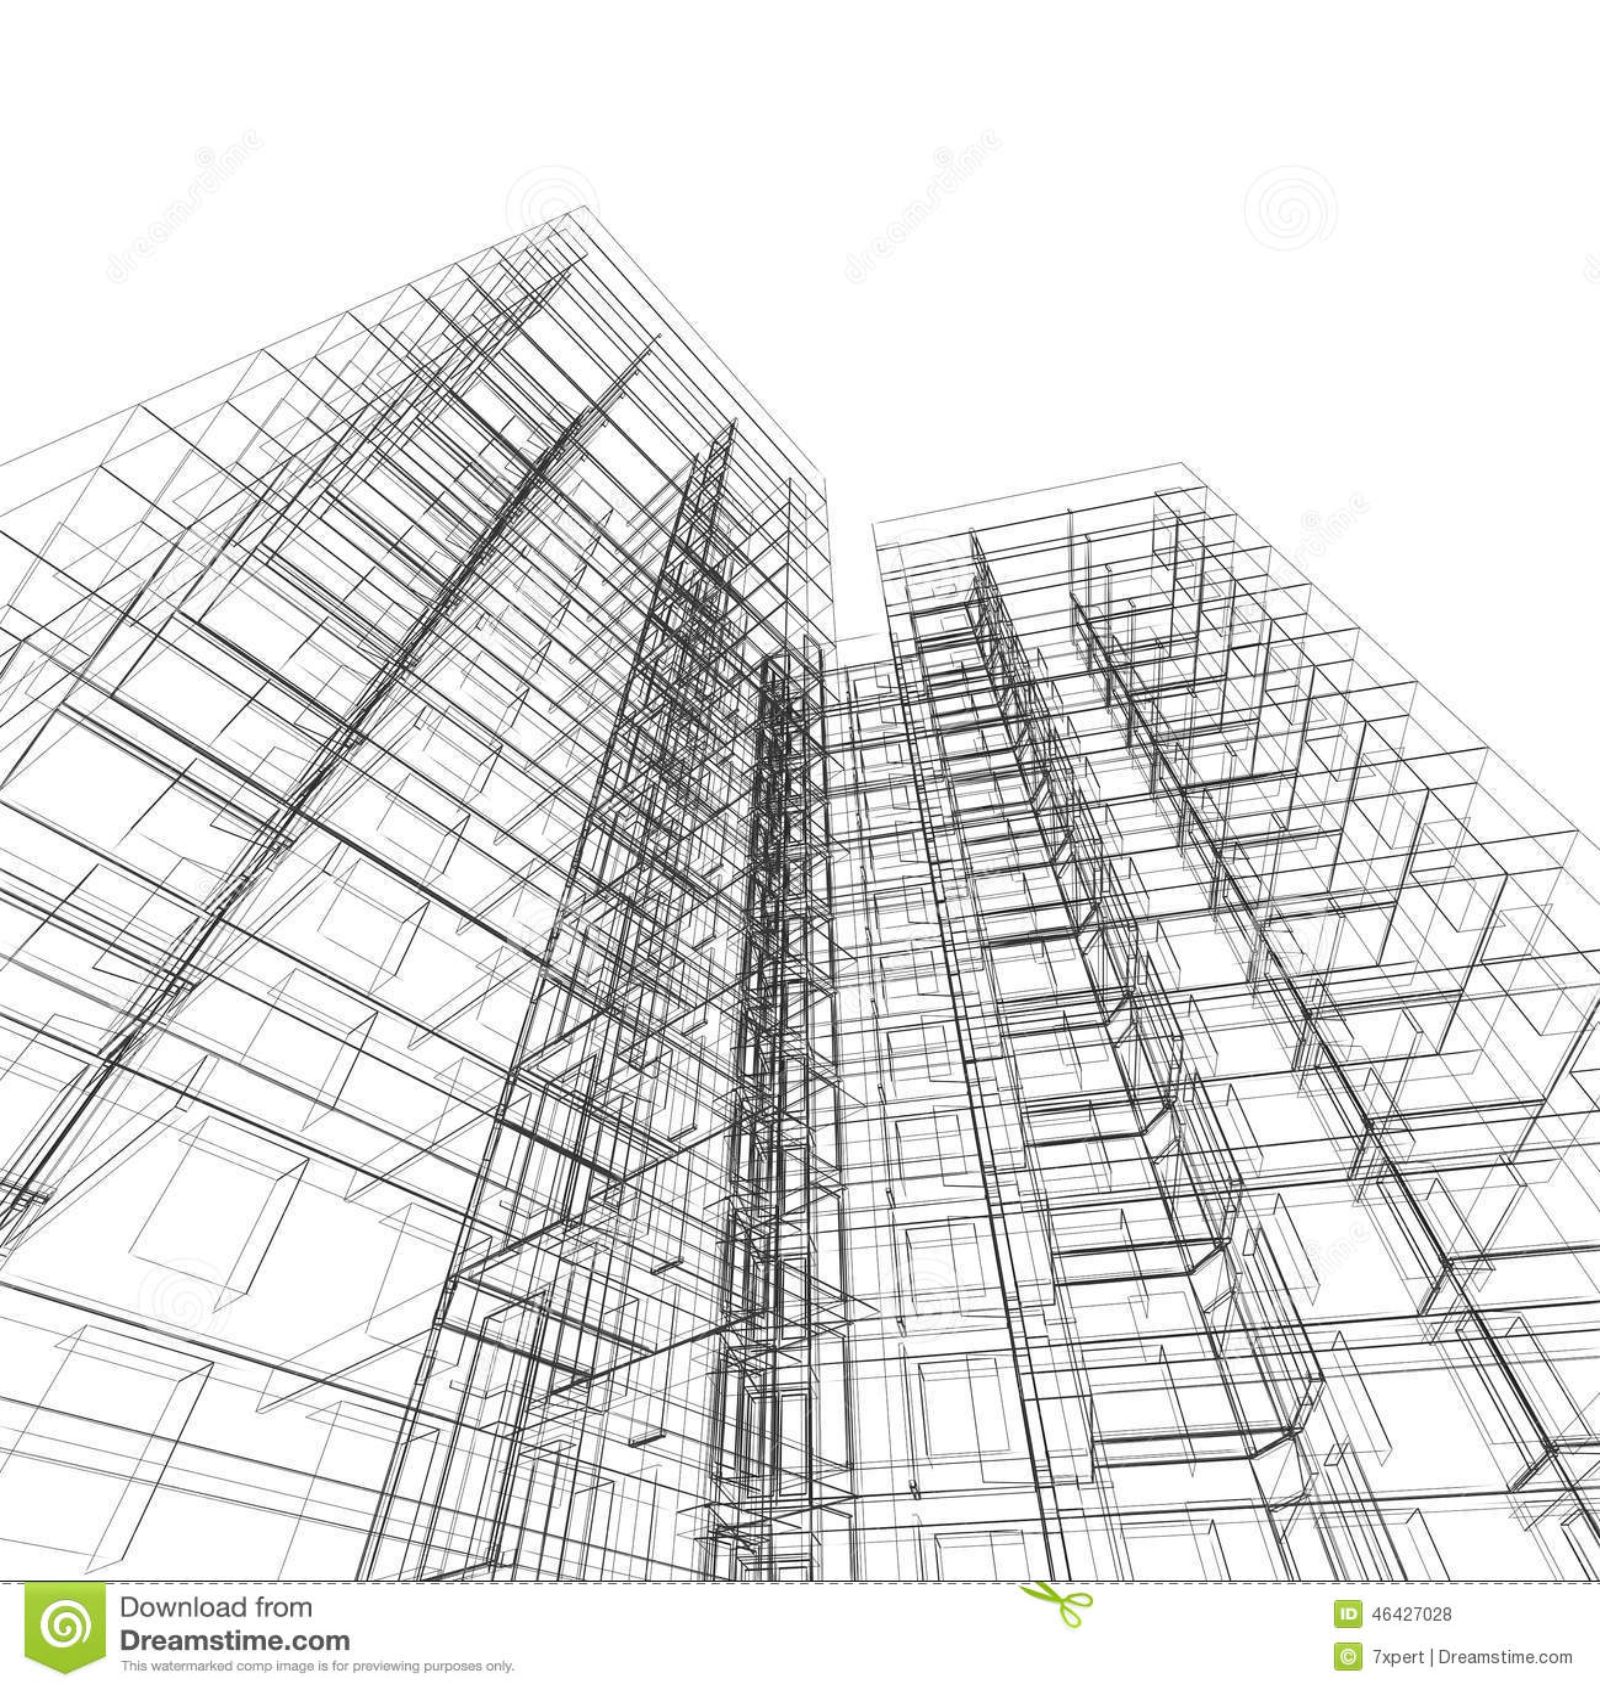 Arquitectura de la construcci n stock de ilustraci n for Arquitectura diseno y construccion